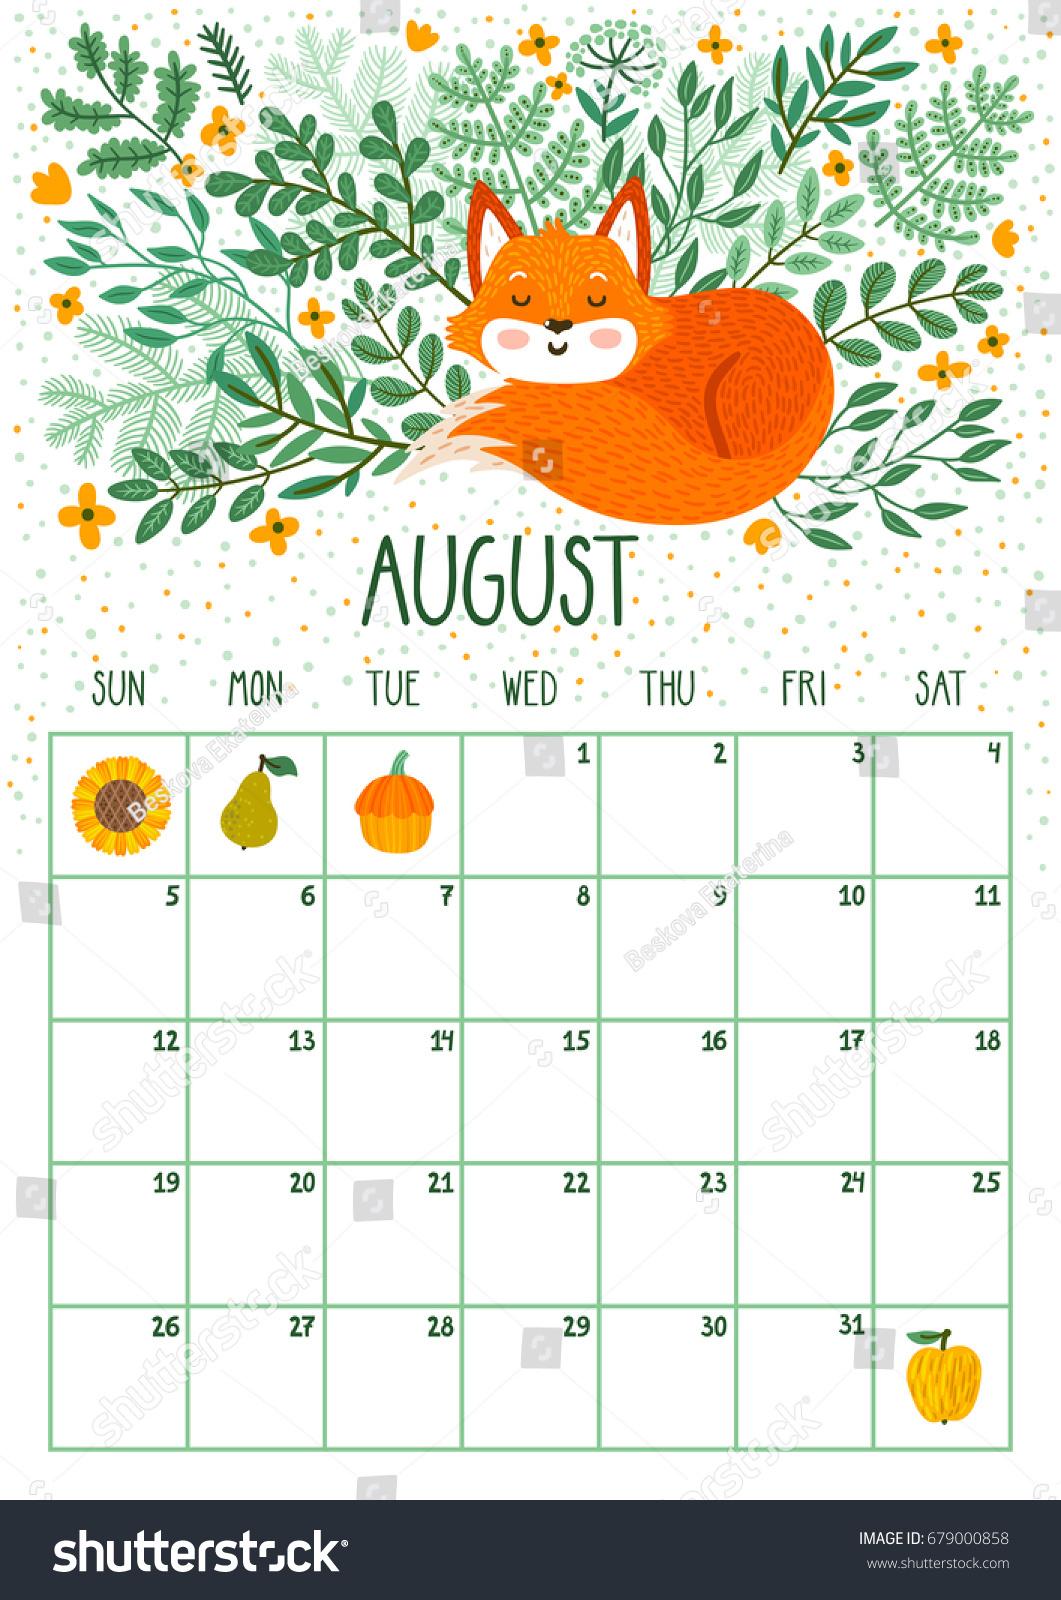 Weekly Calendar Cartoon : Vector monthly calendar cute sleeping fox stock